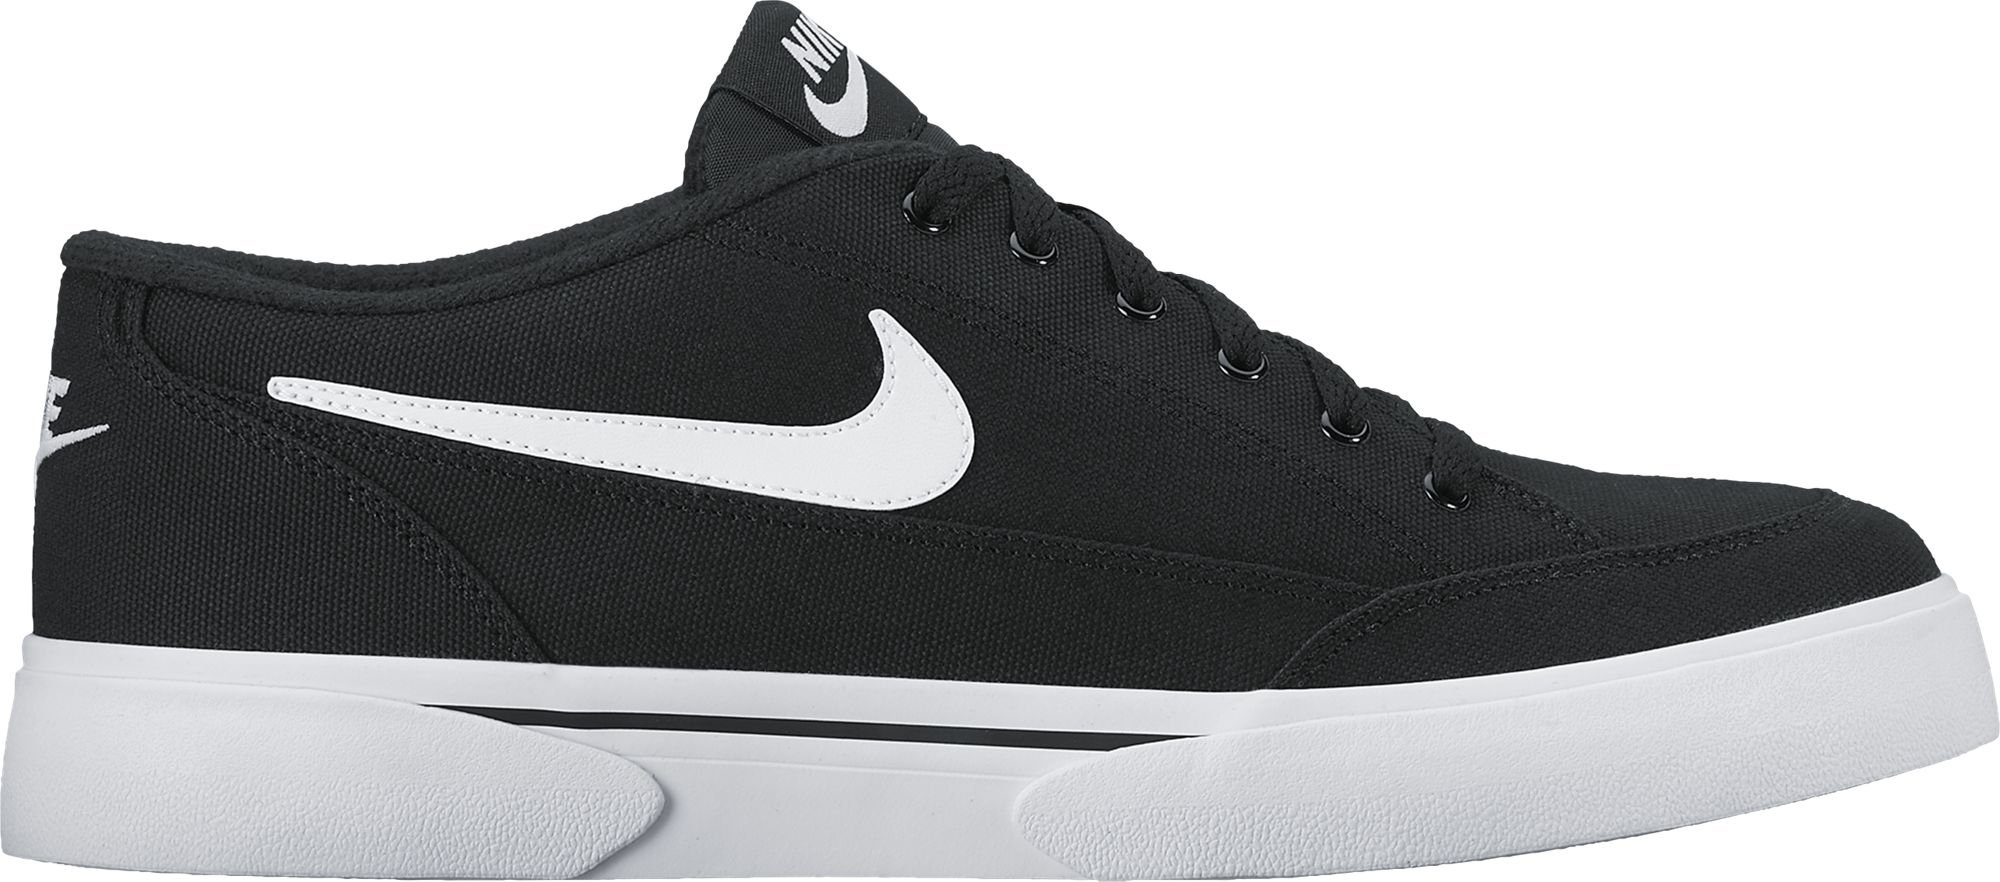 NIKE Men's Gts '16 TXT Casual Shoe Black/White 7.5